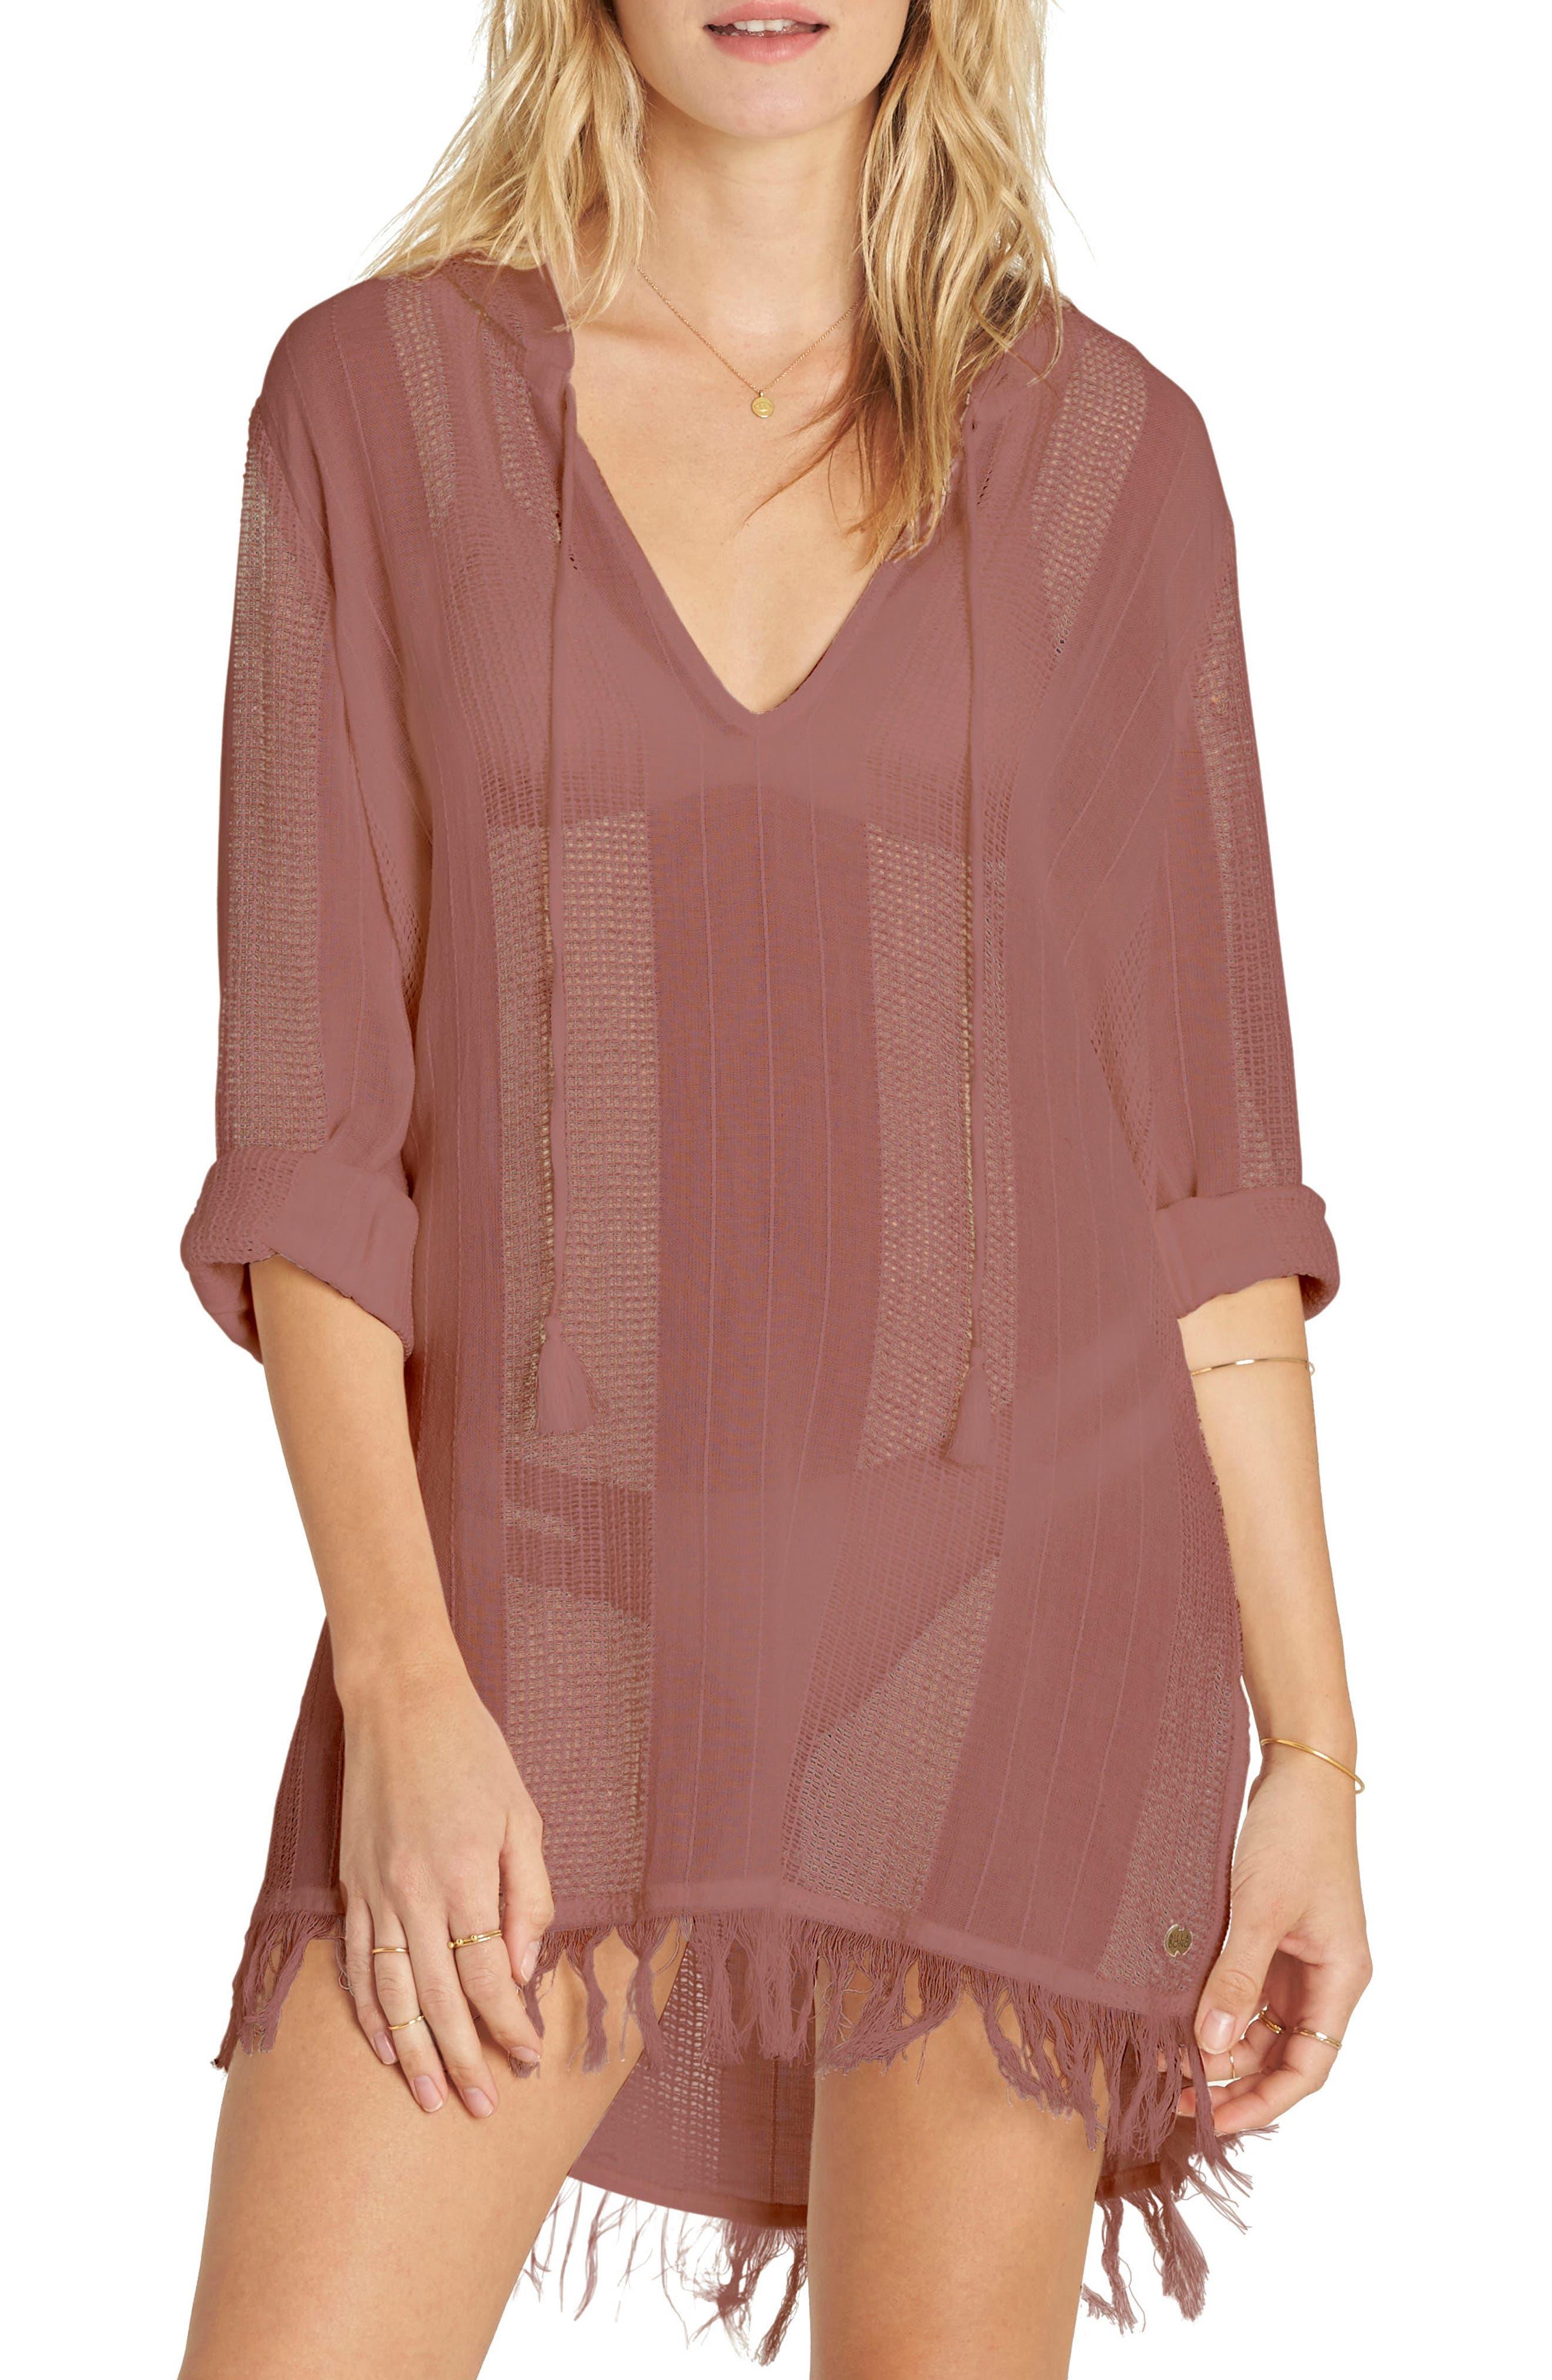 Main Image - Billabong Babe Side Cover-Up Dress